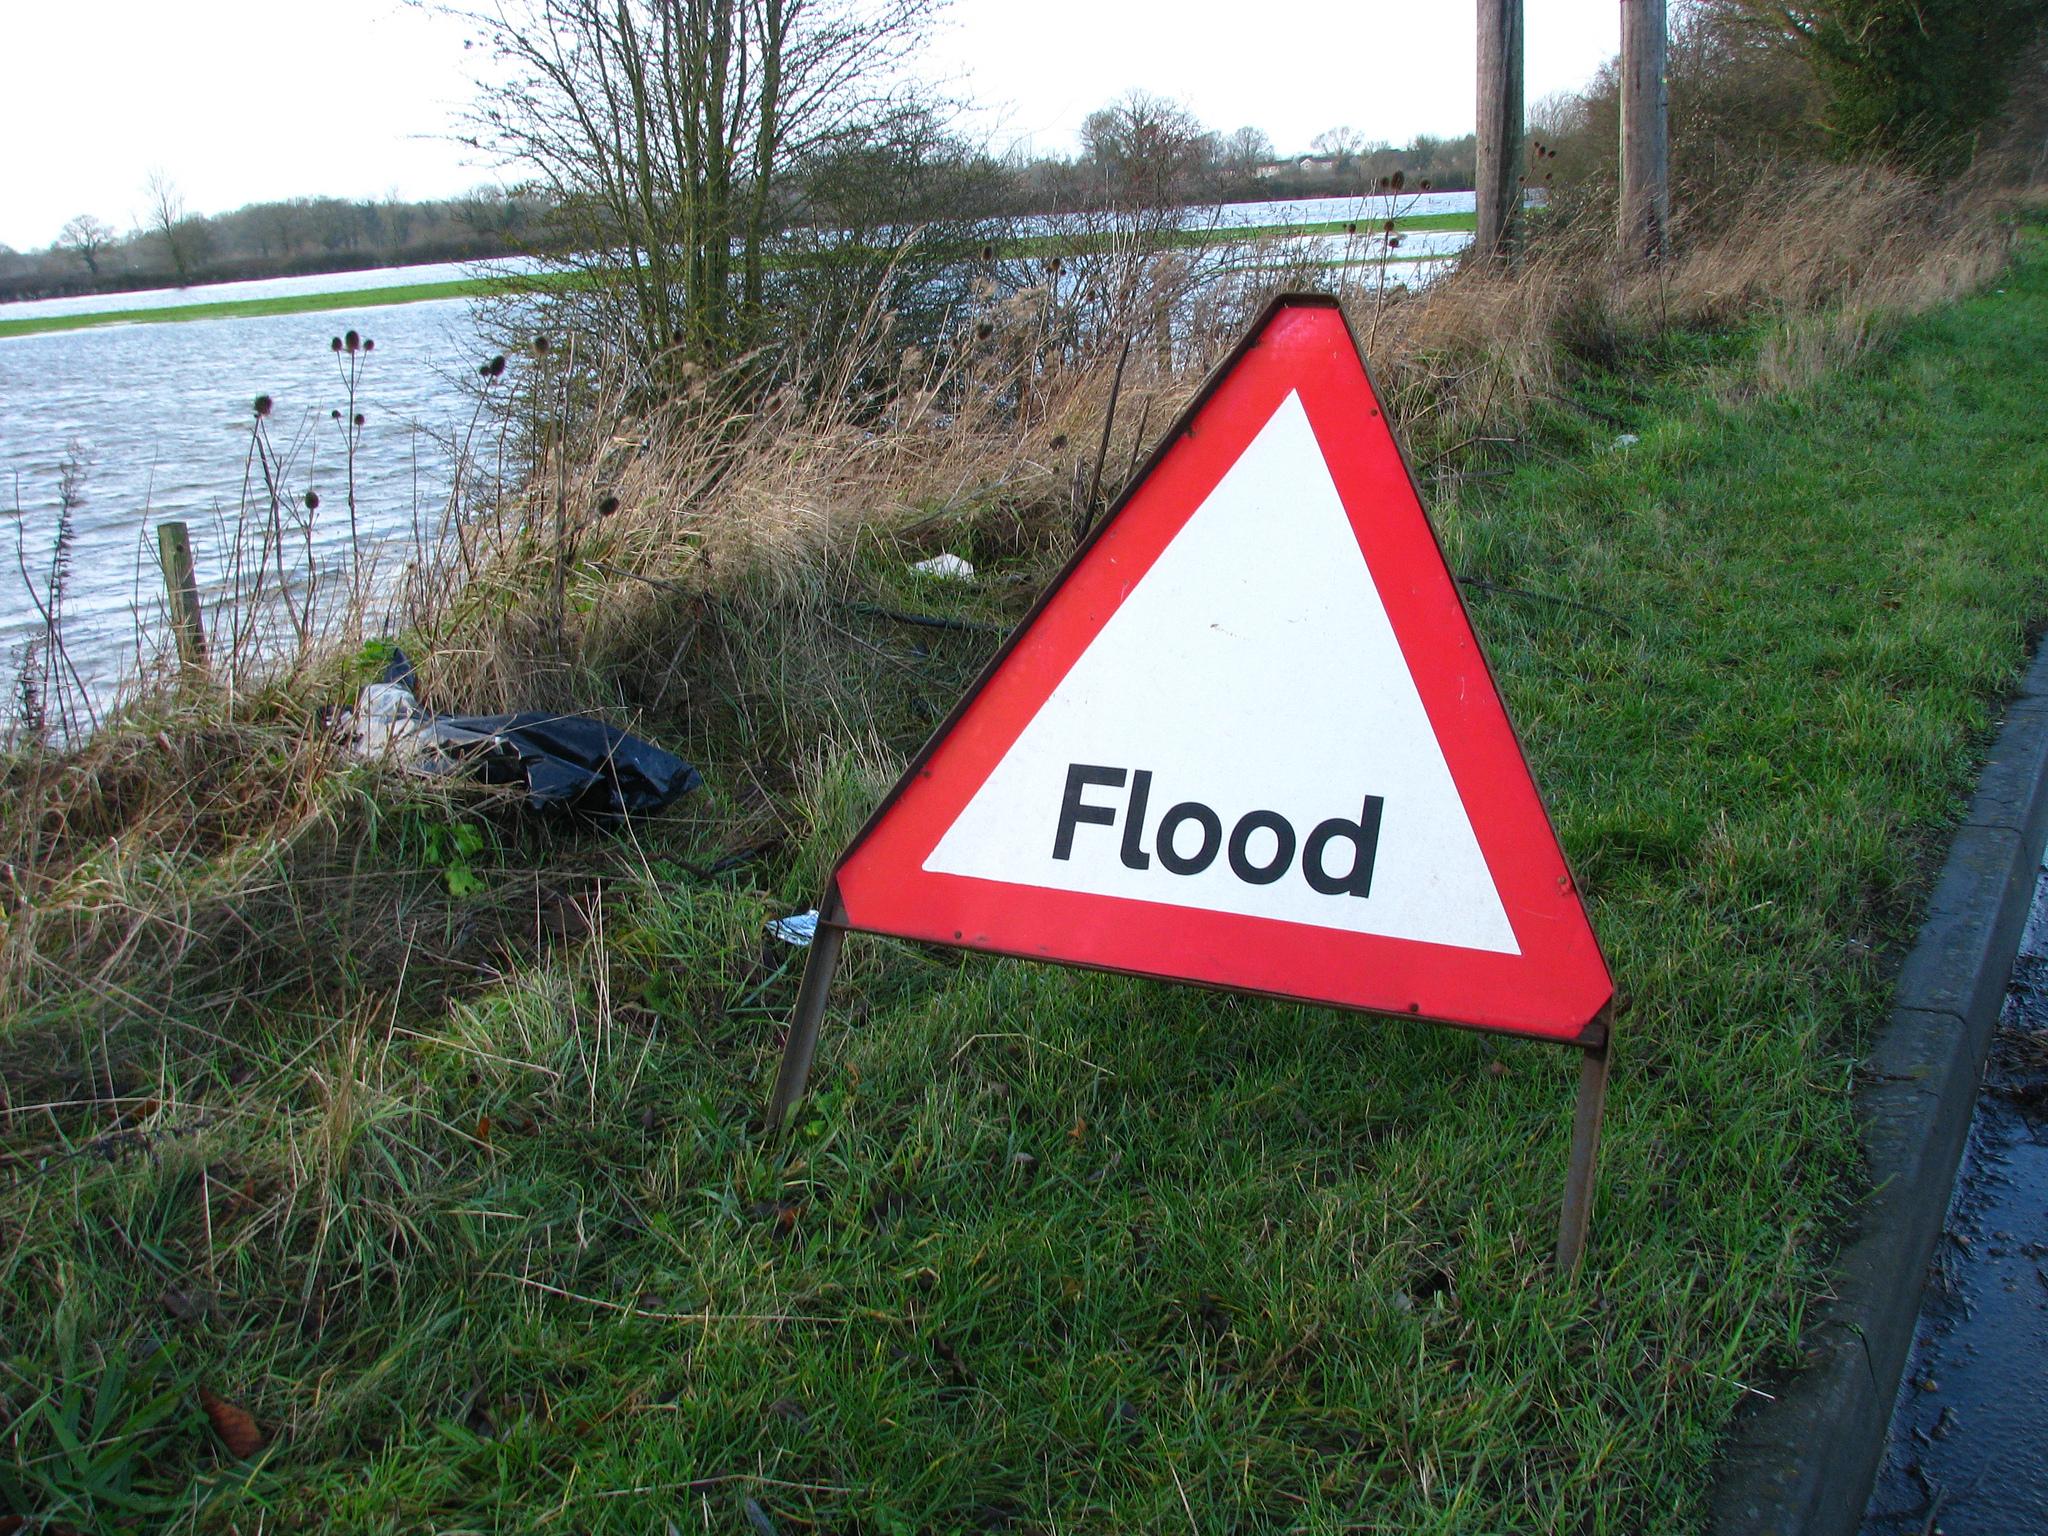 flood-sign_-tico-_flickr